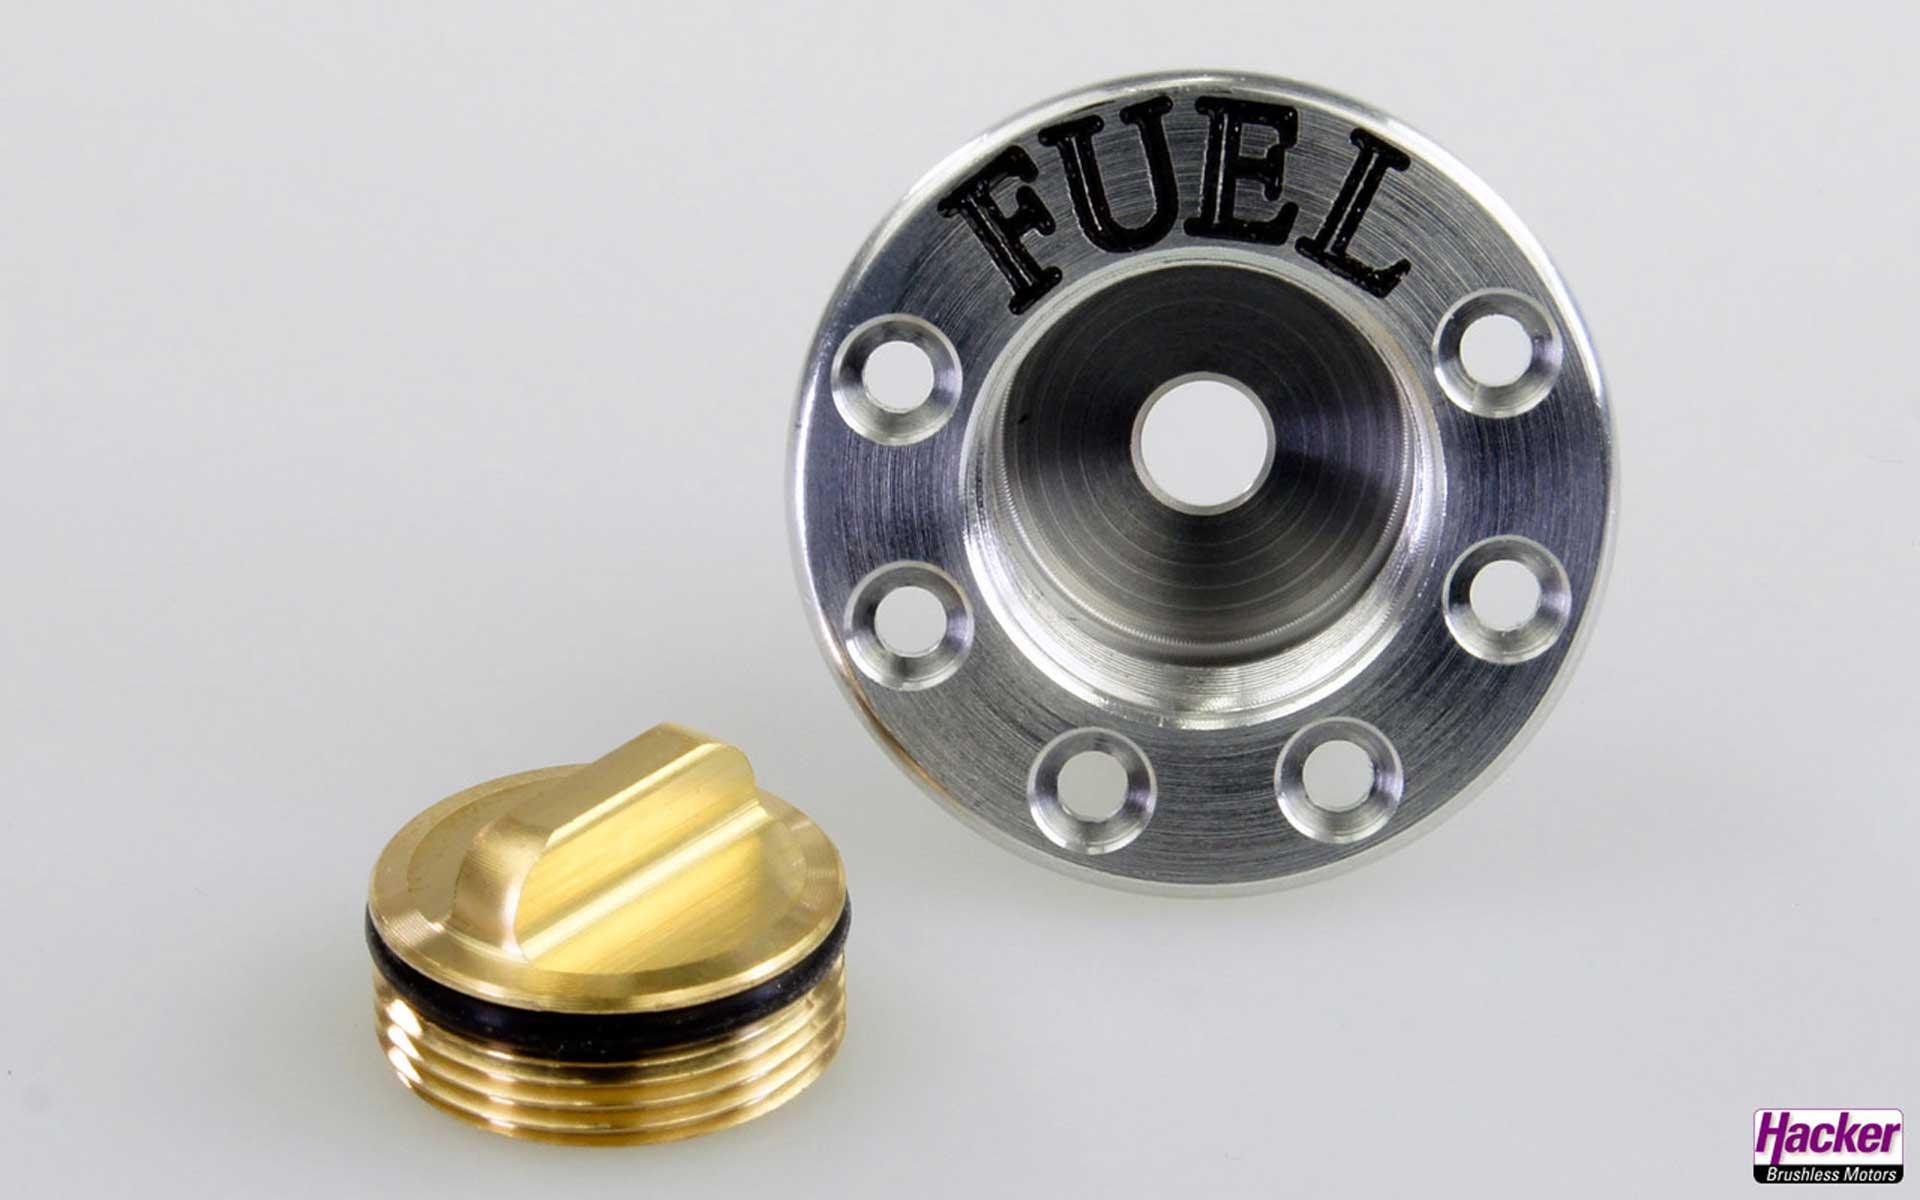 HACKER Refuelling valve FUEL lockable